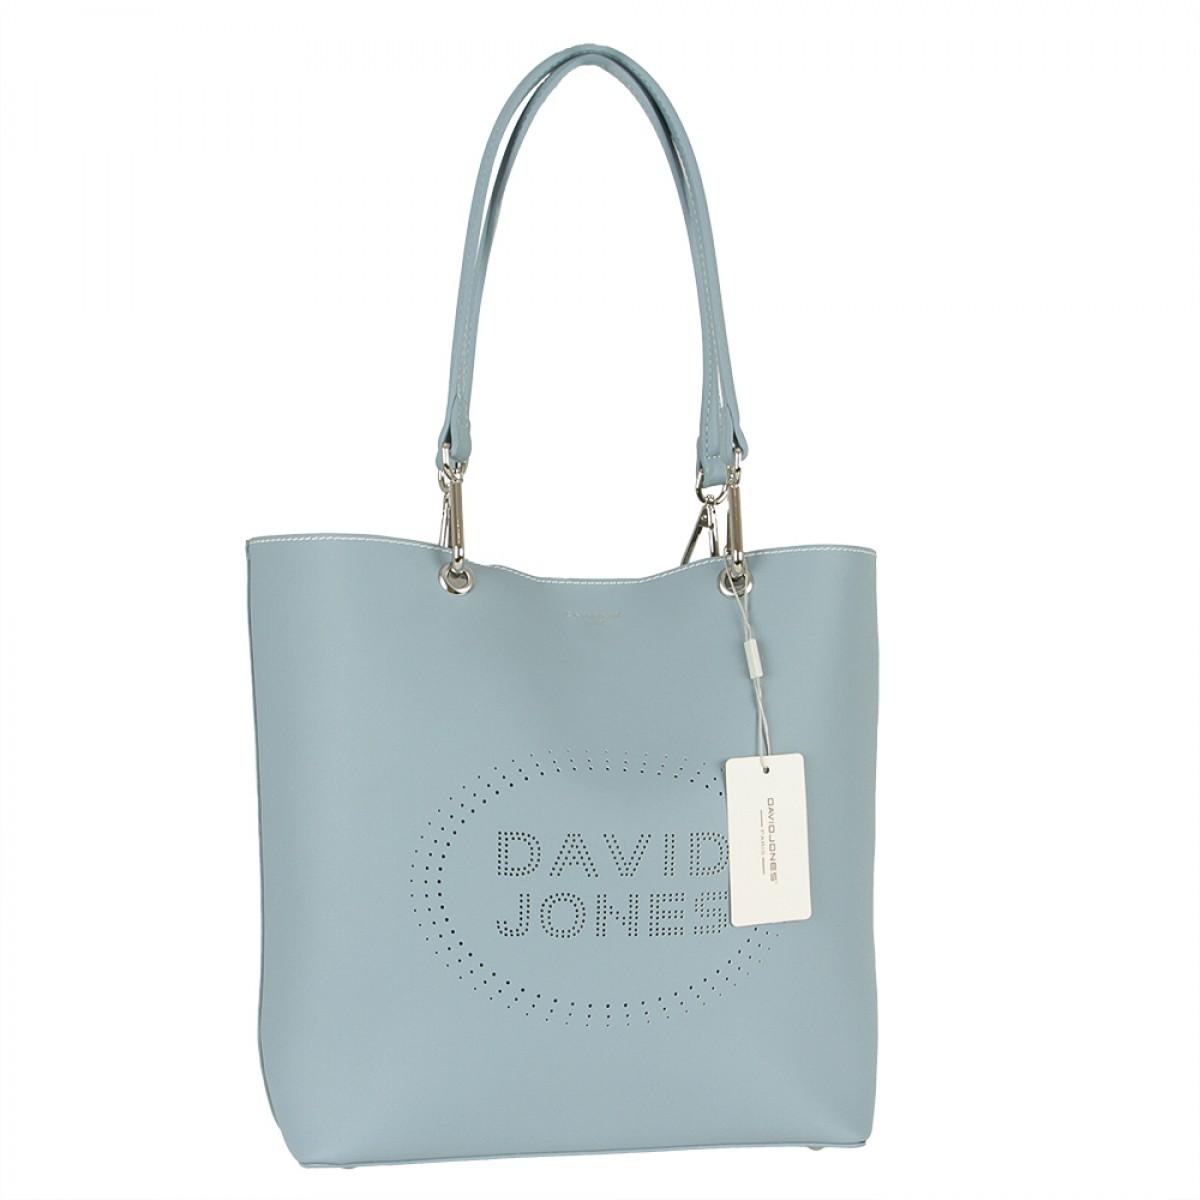 Жіноча сумка David Jones 6223-1 PALE BLUE